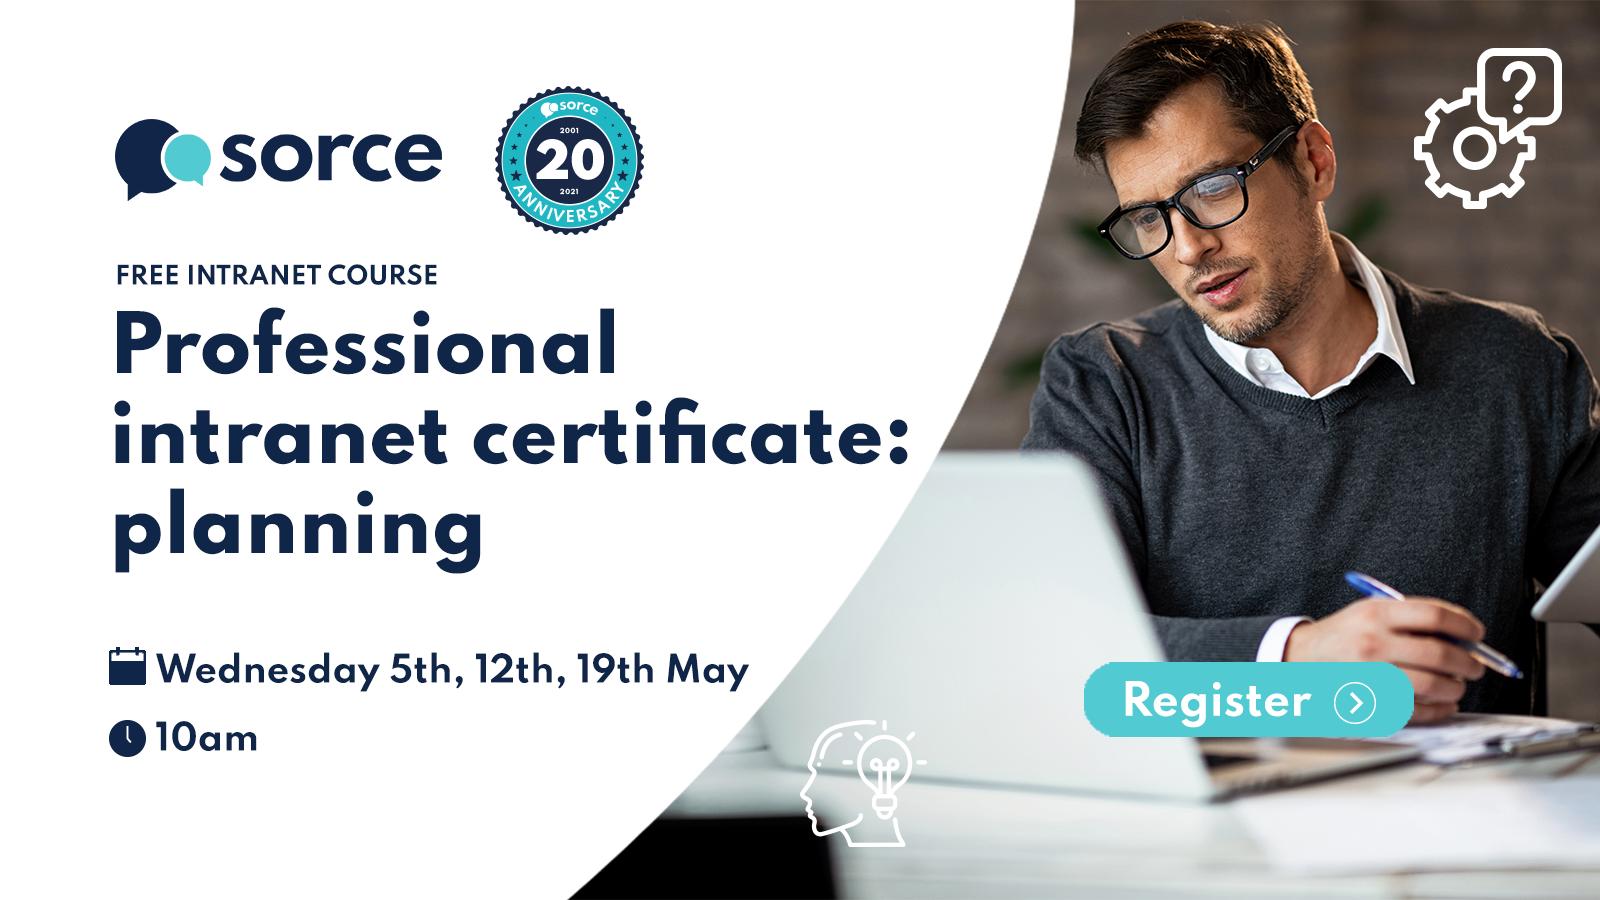 Sorce intranet planning certificate